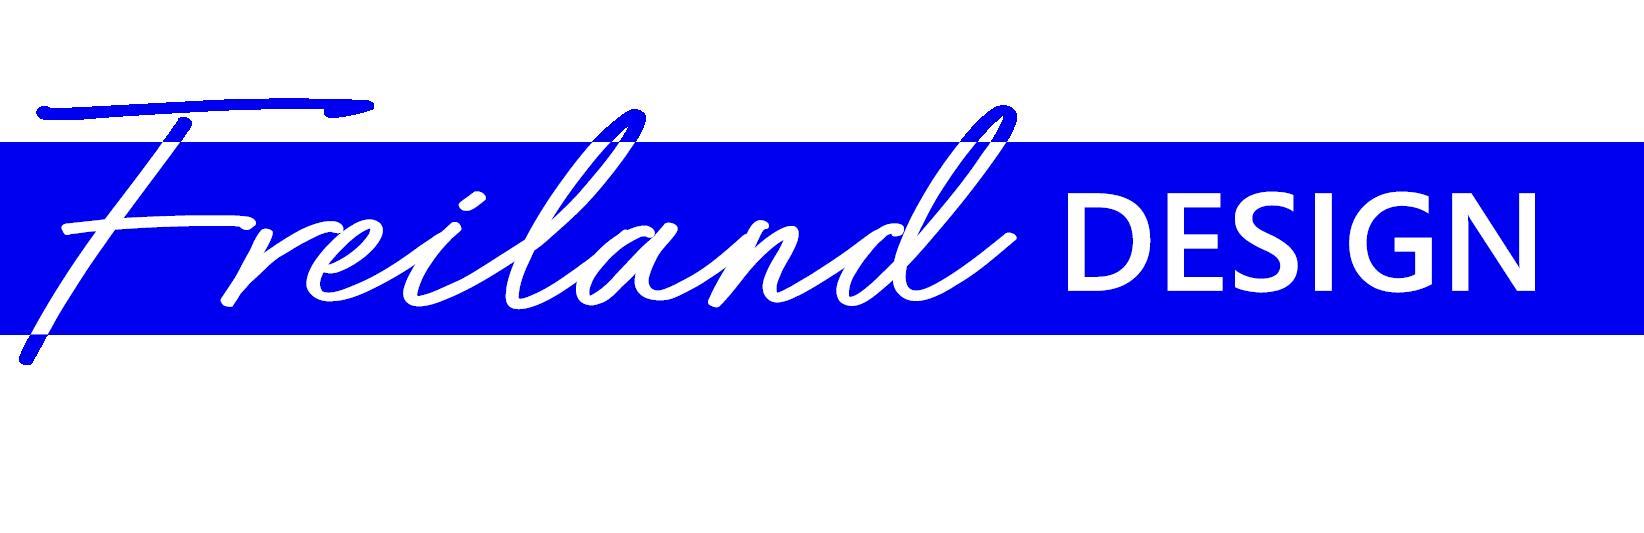 freiland design